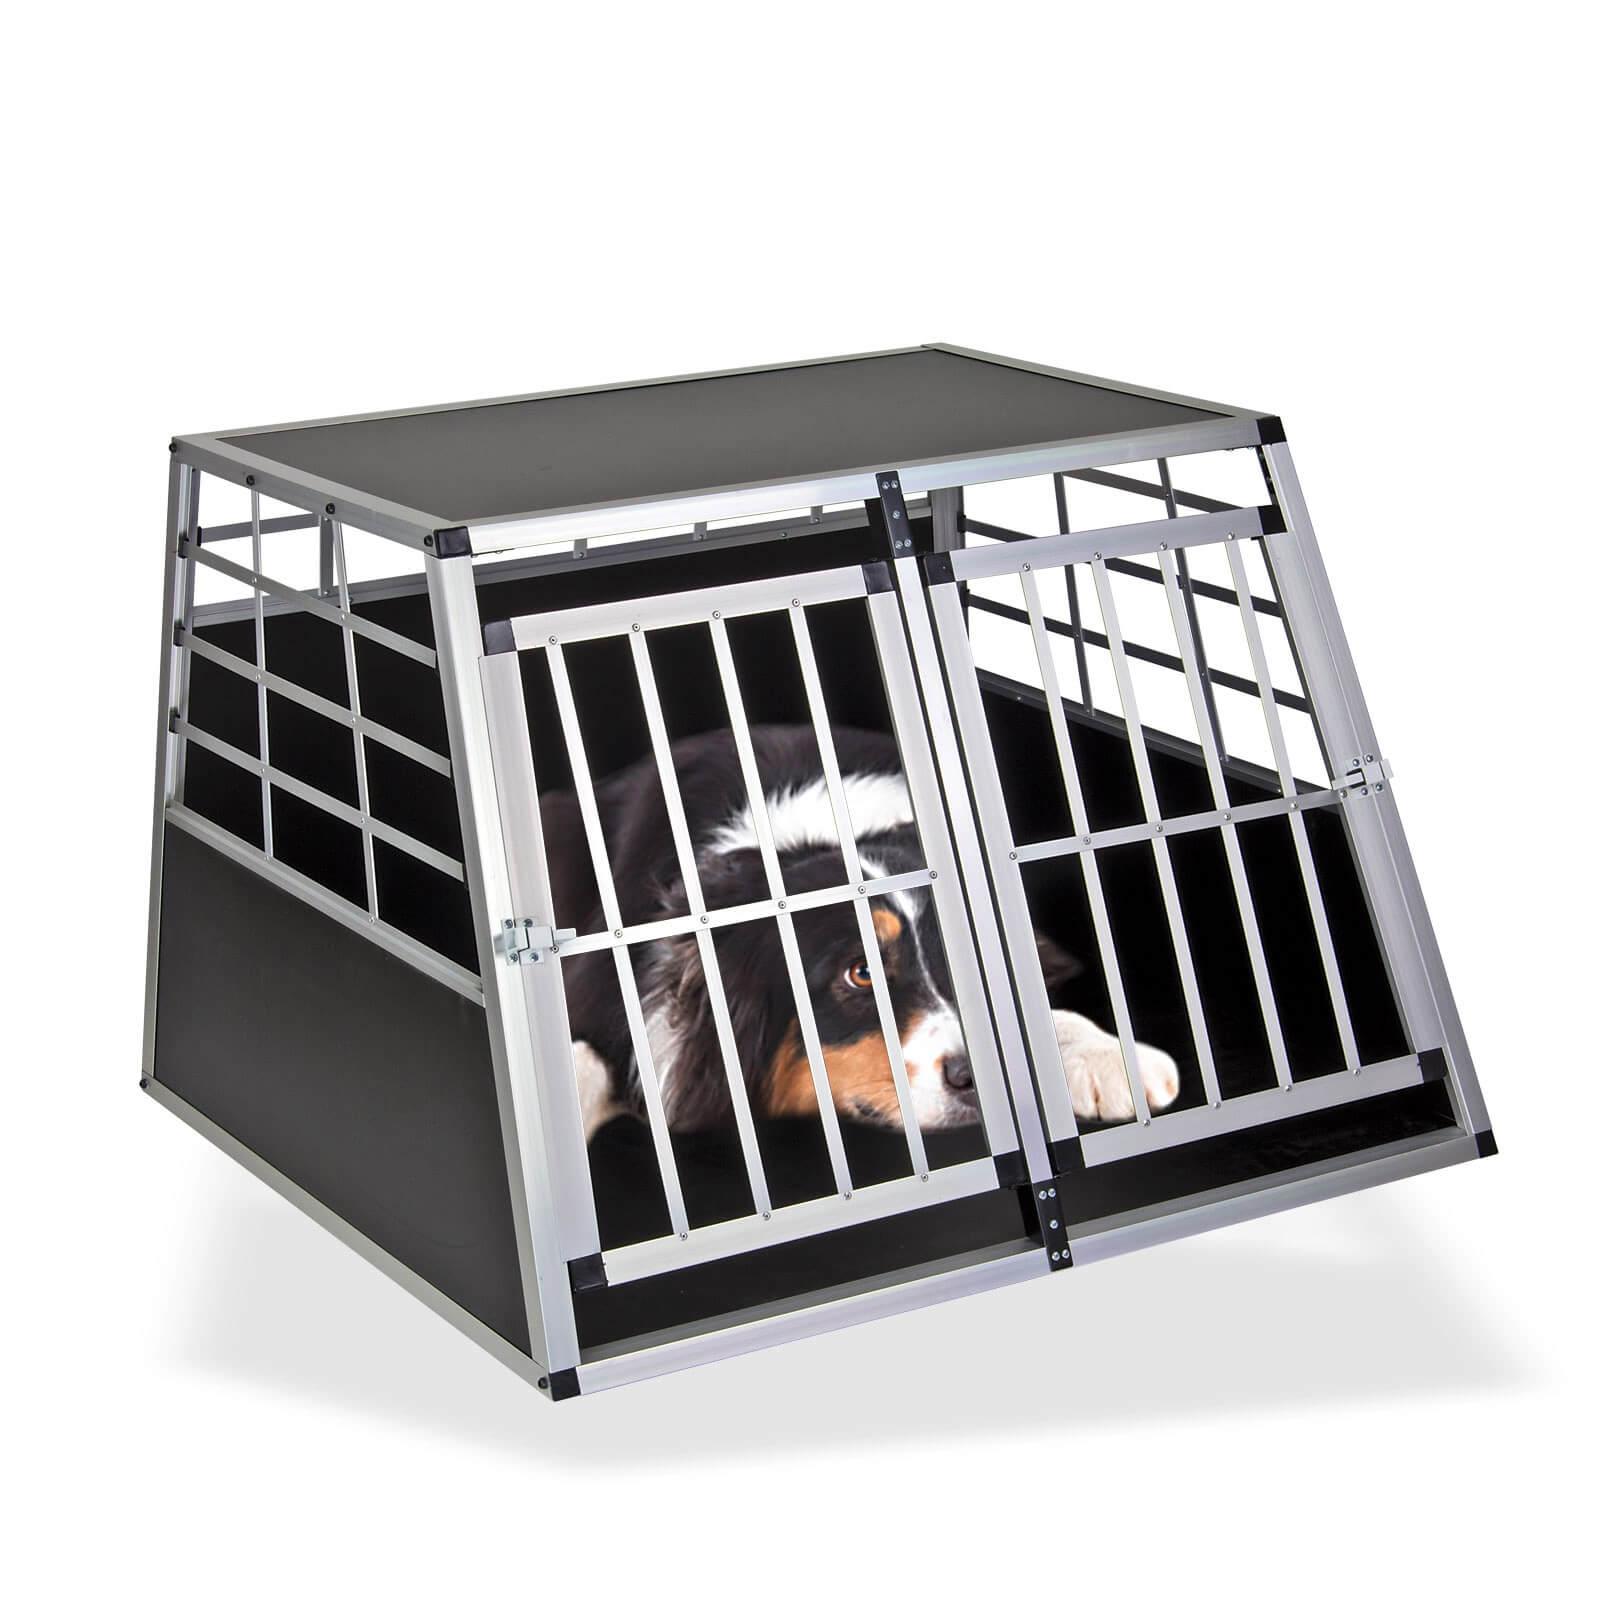 Hundebox / Hundetransportbox Balu für Auto Kfz